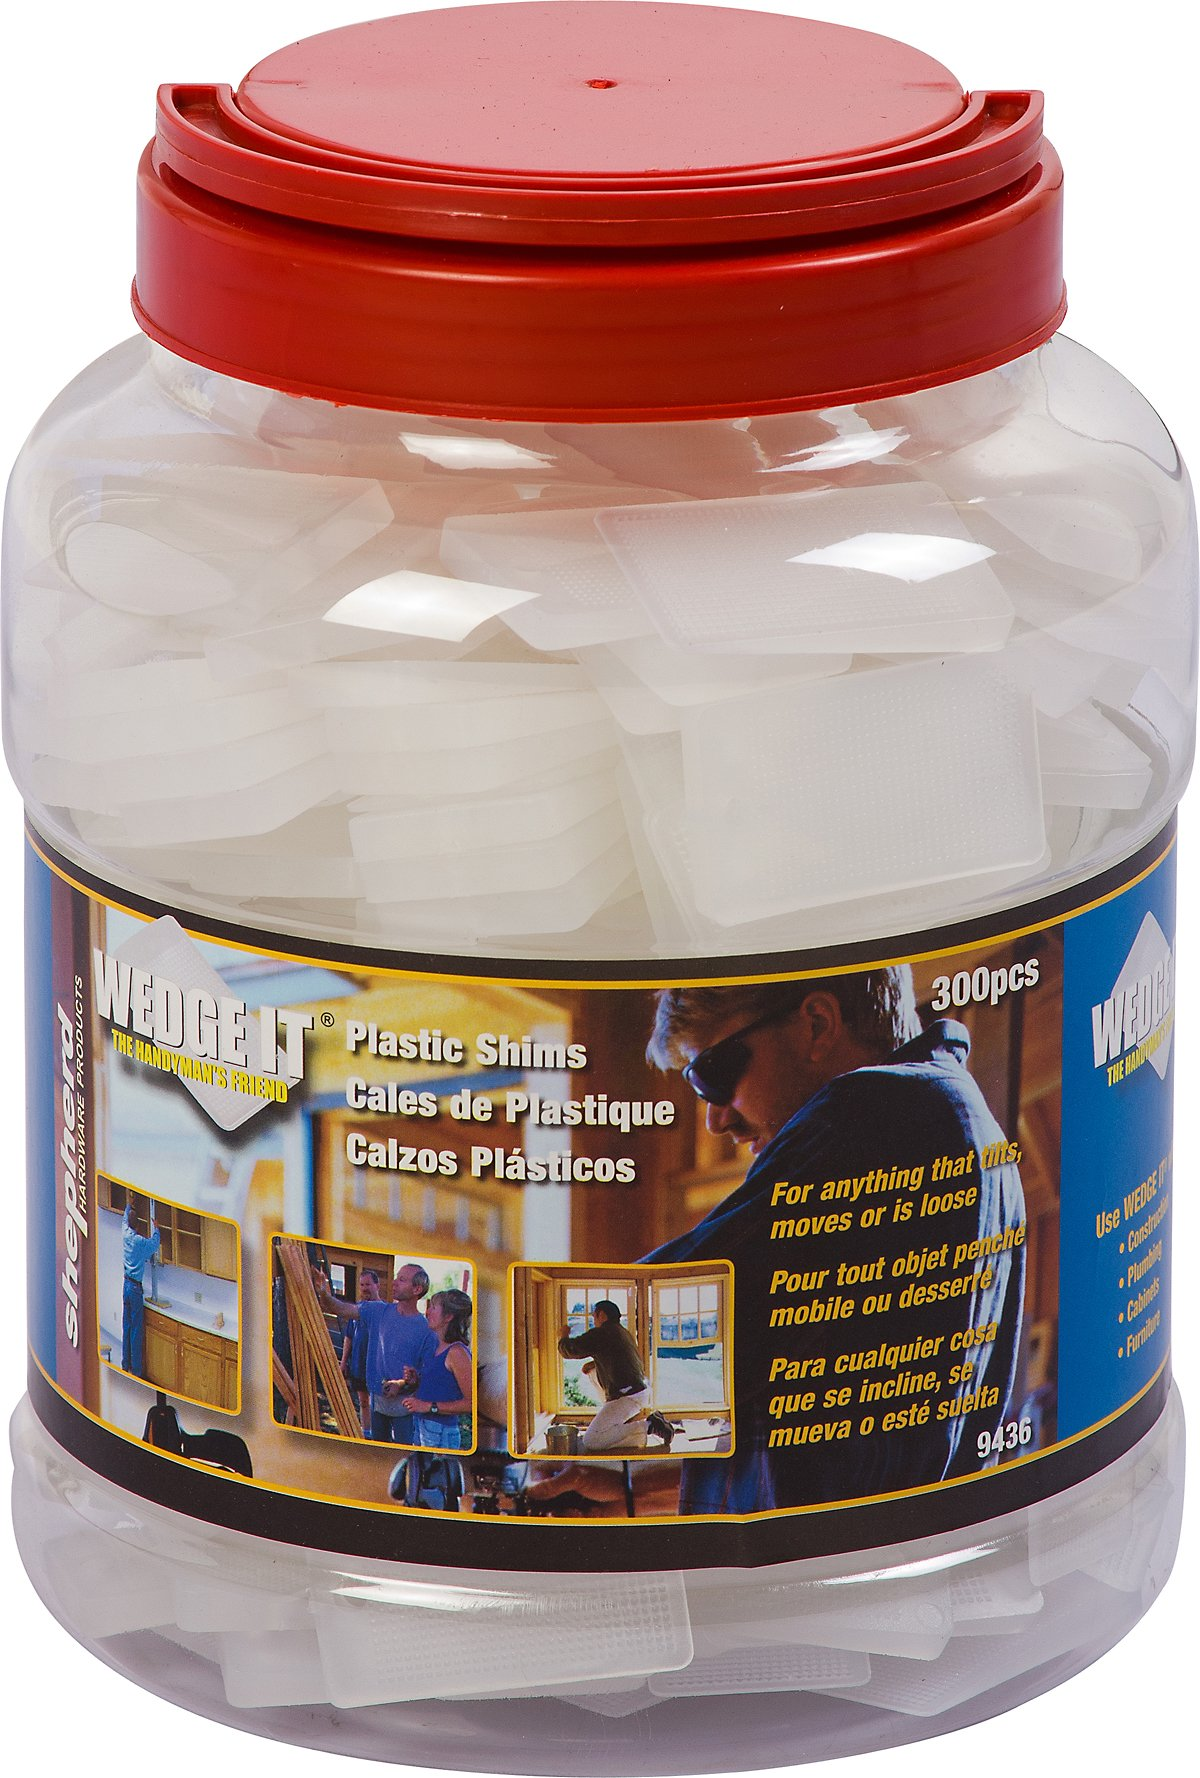 Shepherd Hardware 9436 Wedge-It Plastic Shims, 300-Pack Jar